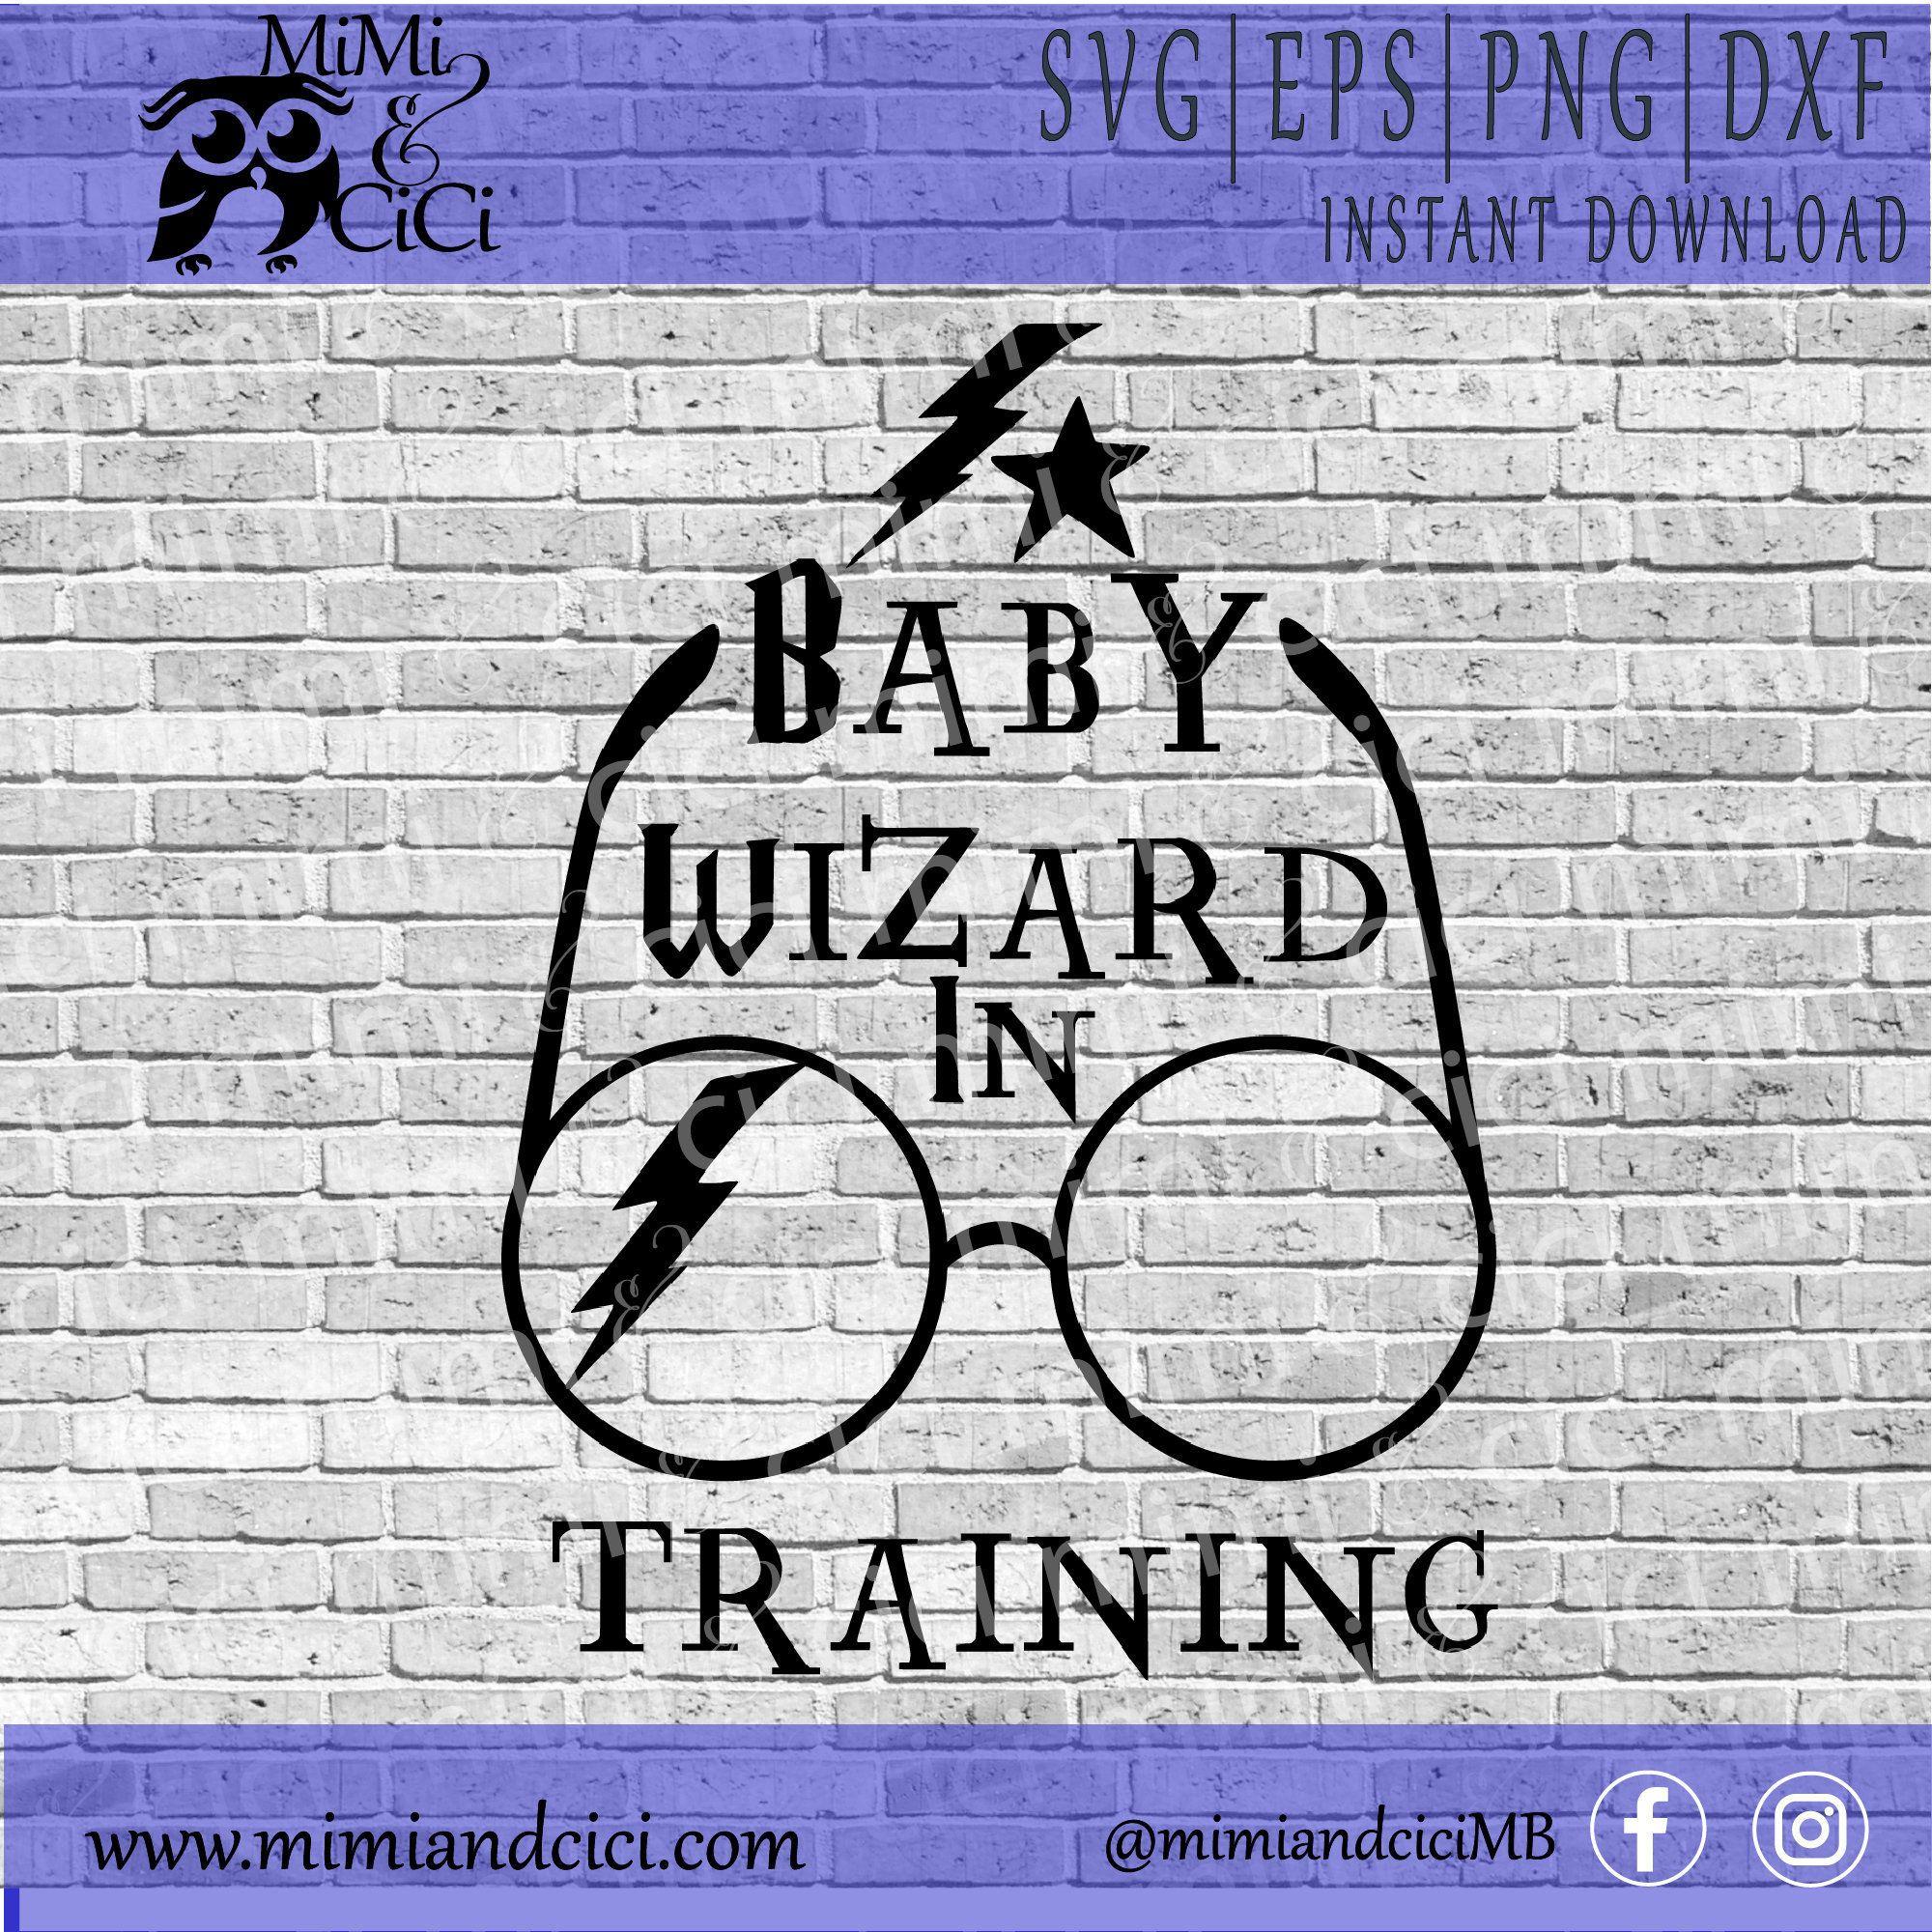 Download Baby Wizard SVG - Harry Potter SVG -SVG files for cricut ...